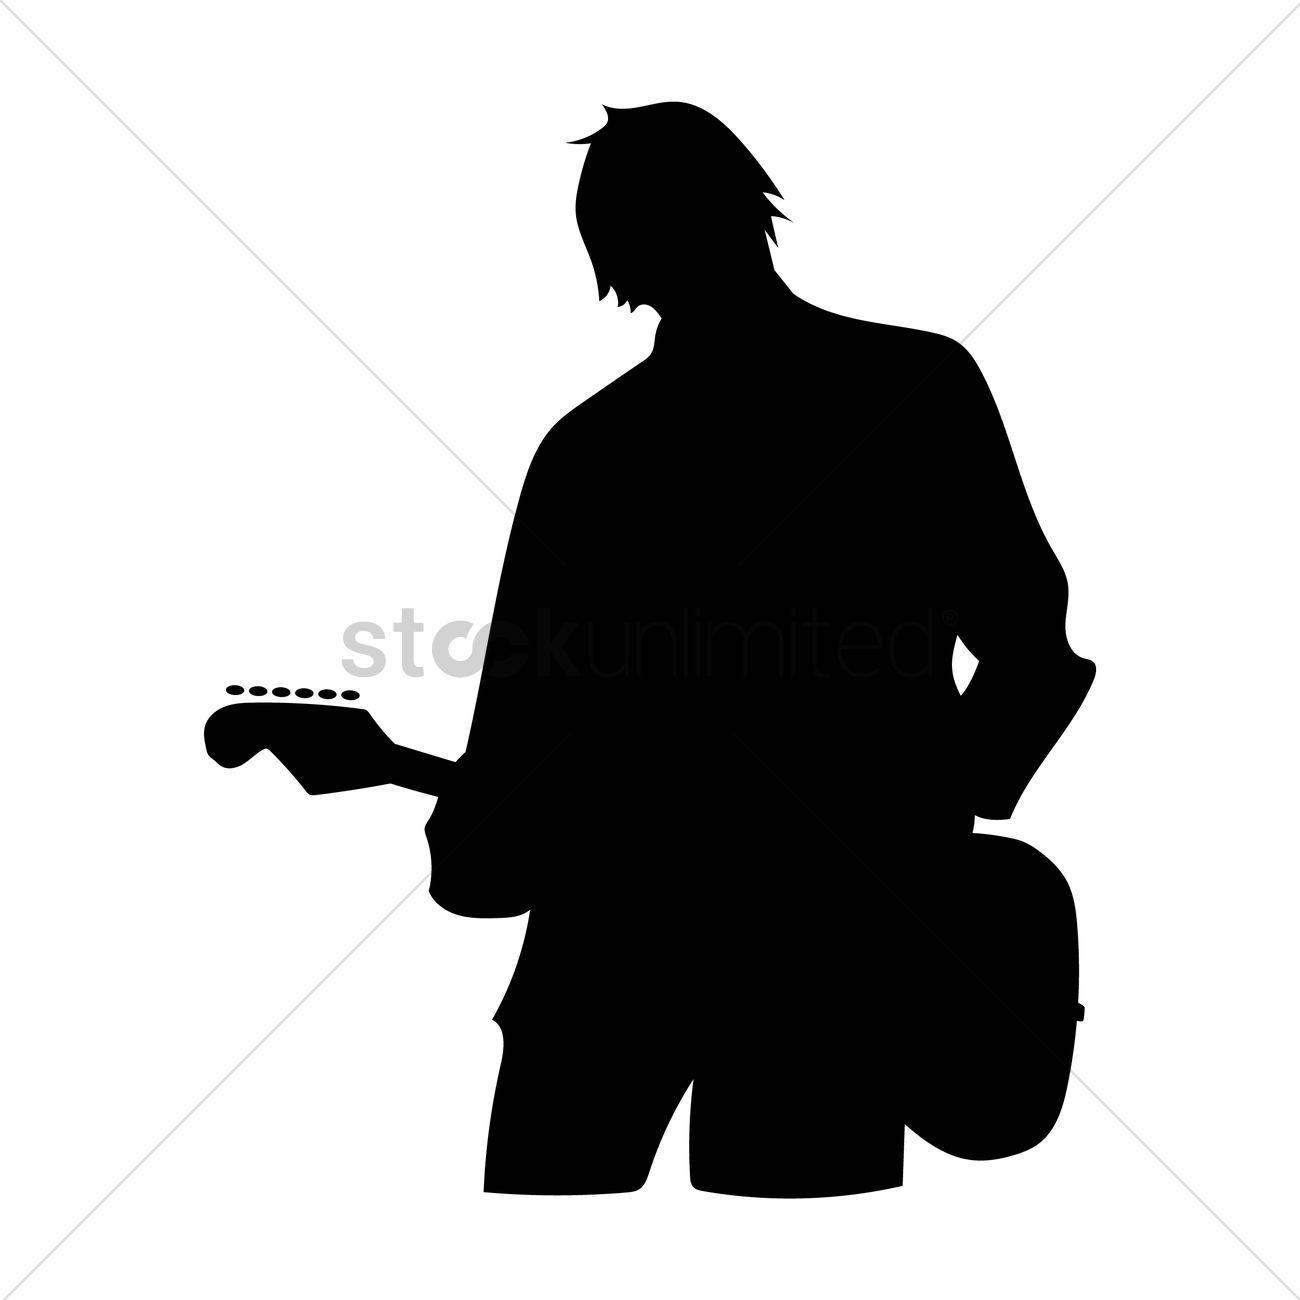 1300x1300 Black Silhouette Silhouettes Man Men Guy Guys Human People Person